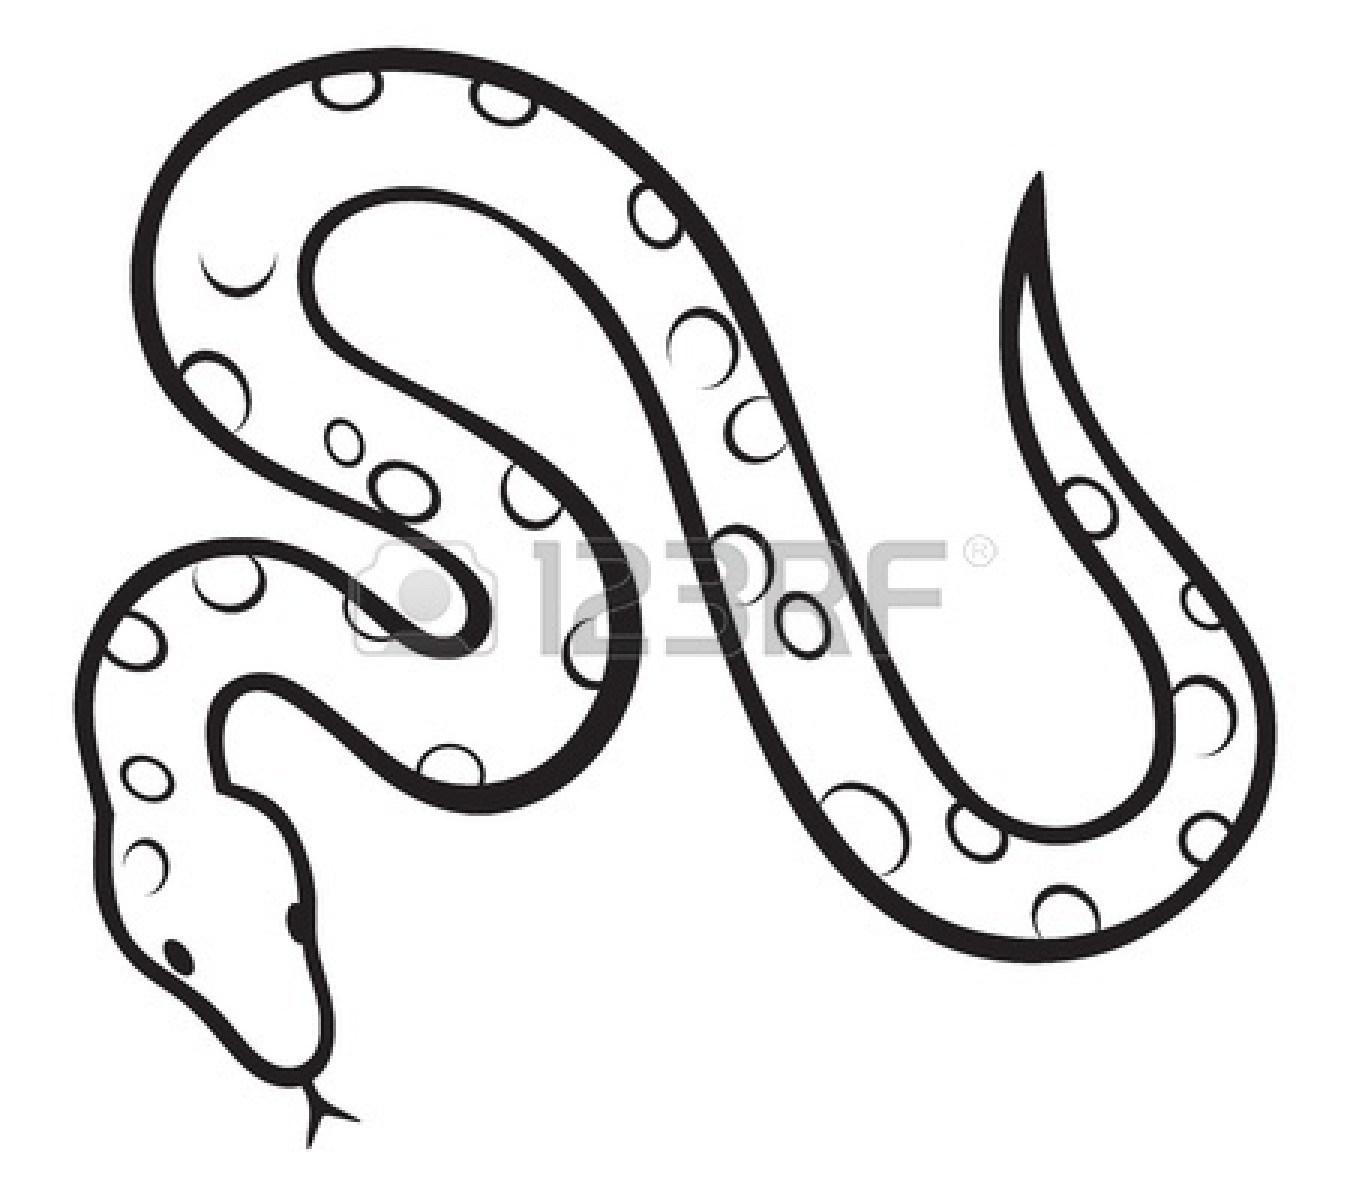 Black and white snake clipart 3 » Clipart Portal.